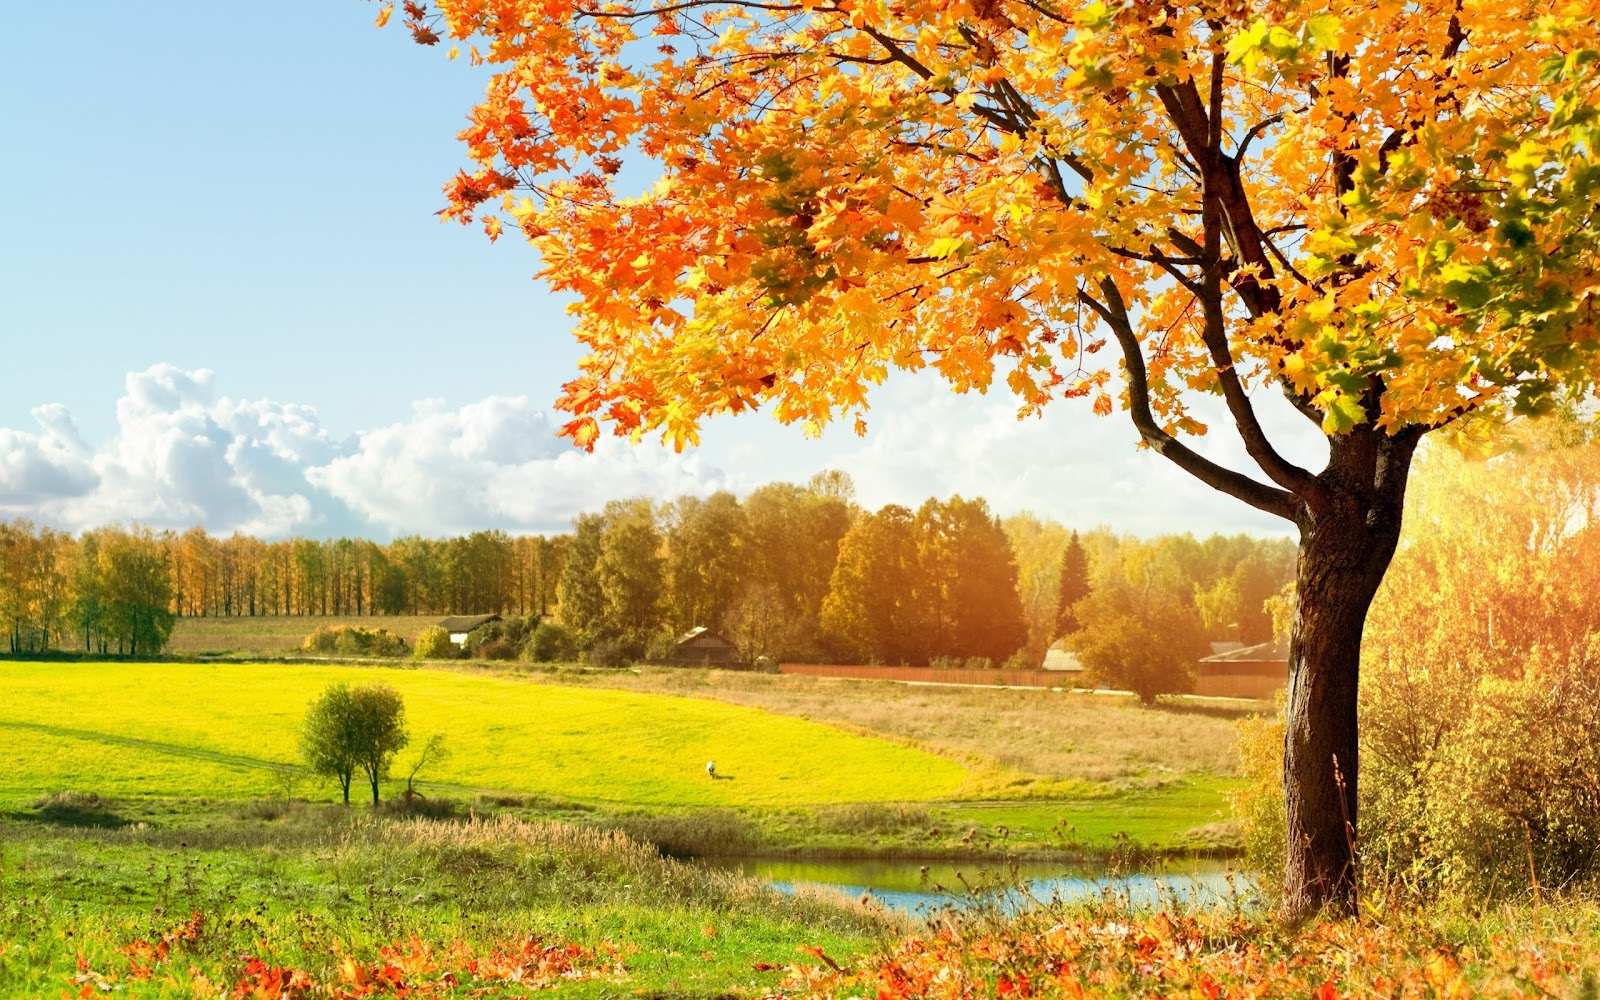 http://3.bp.blogspot.com/-zNeucucrCe8/T8REWxdOdTI/AAAAAAAAA_U/tp4VvATvUOA/s1600/beautiful-tree-wallpapers_28076_2560x1600.jpg